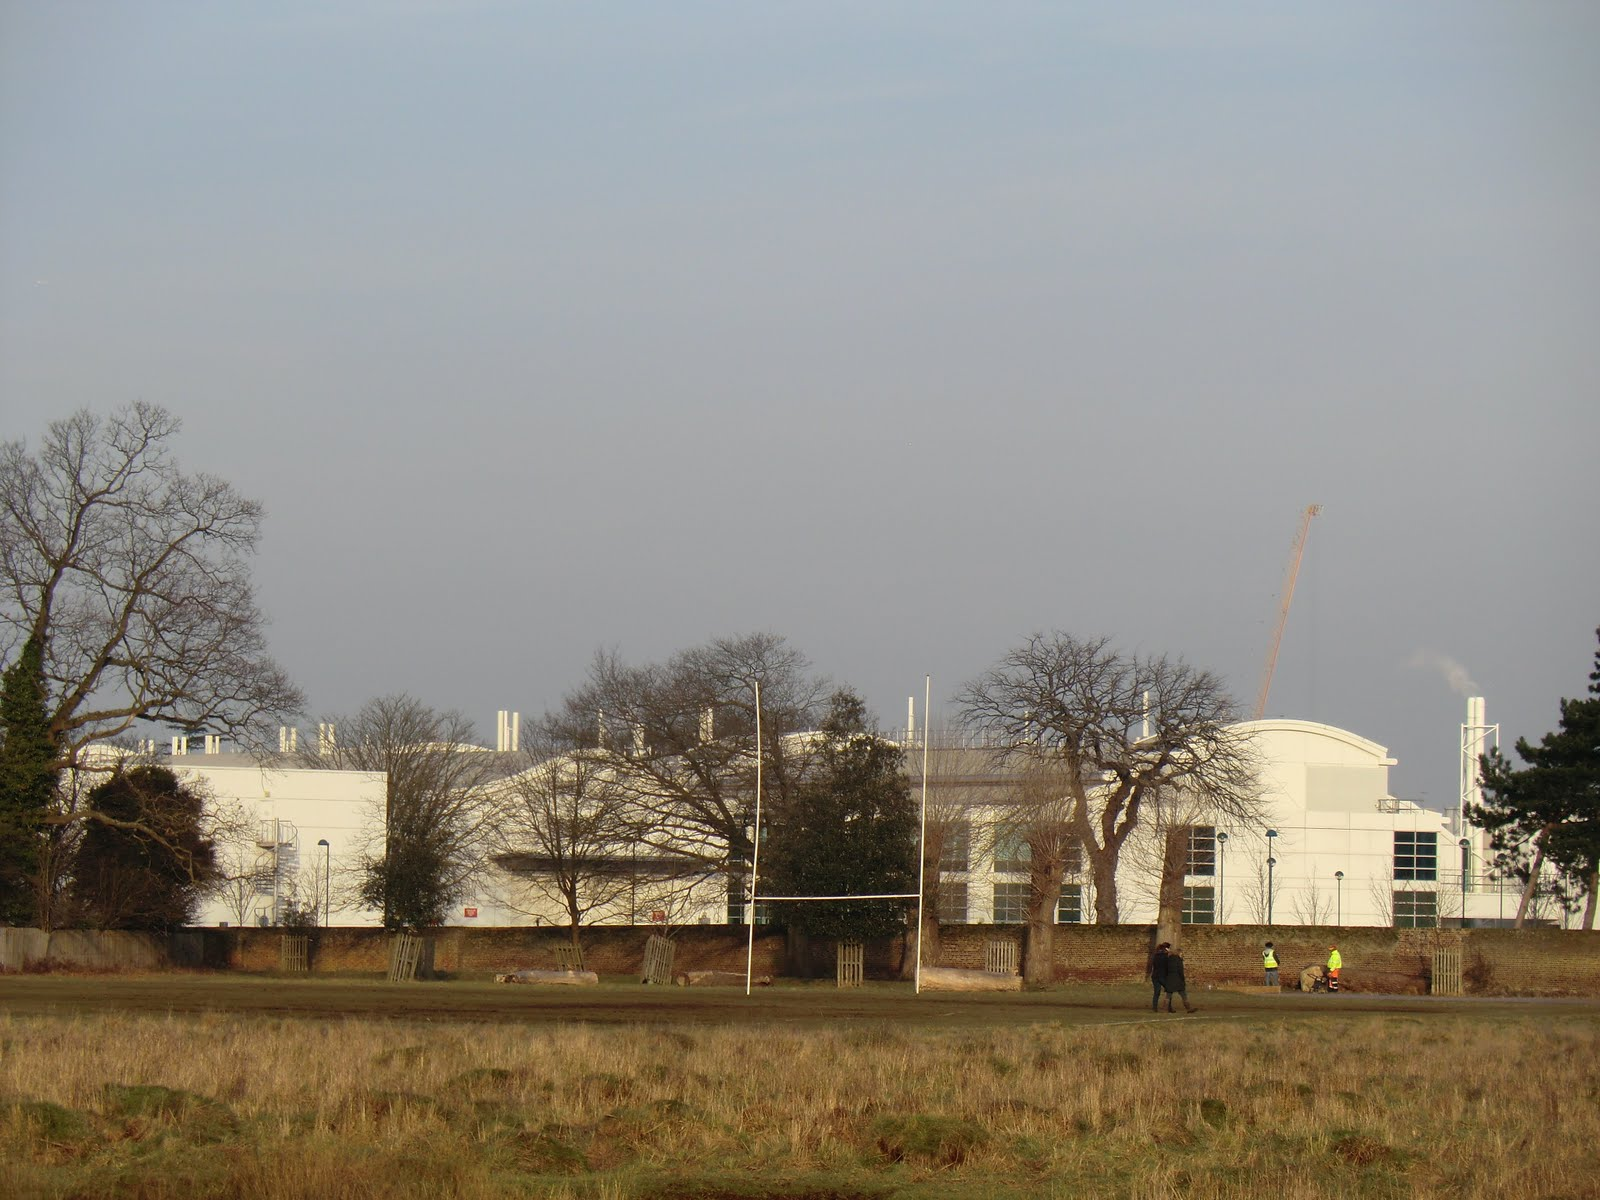 CIMG6555 National Physical Laboratory buildings, Bushy Park